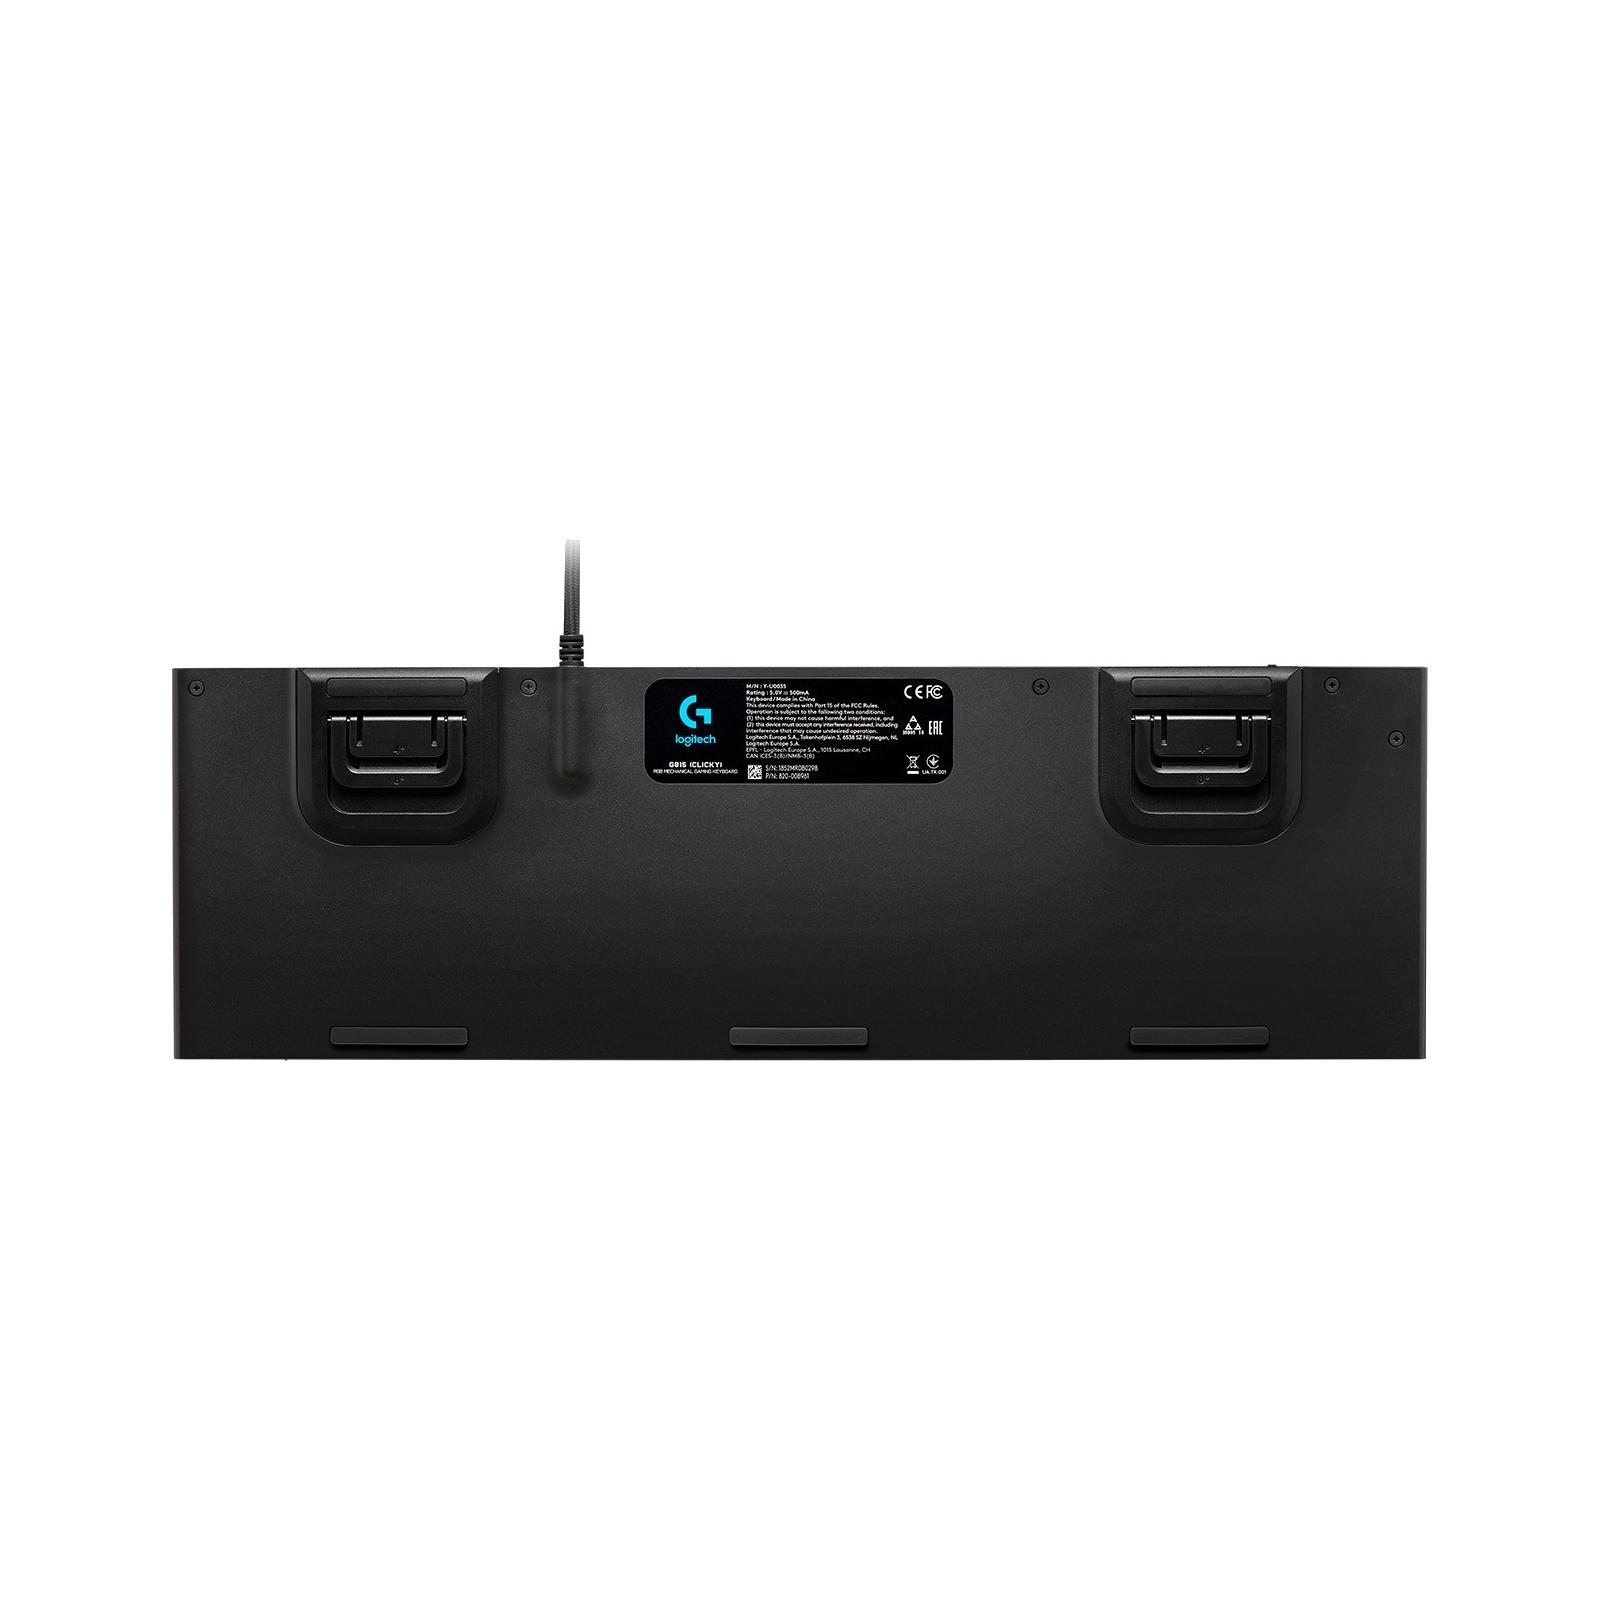 Клавиатура Logitech G815 Lightsync RGB Mechanical GL Linear (920-009007) изображение 4